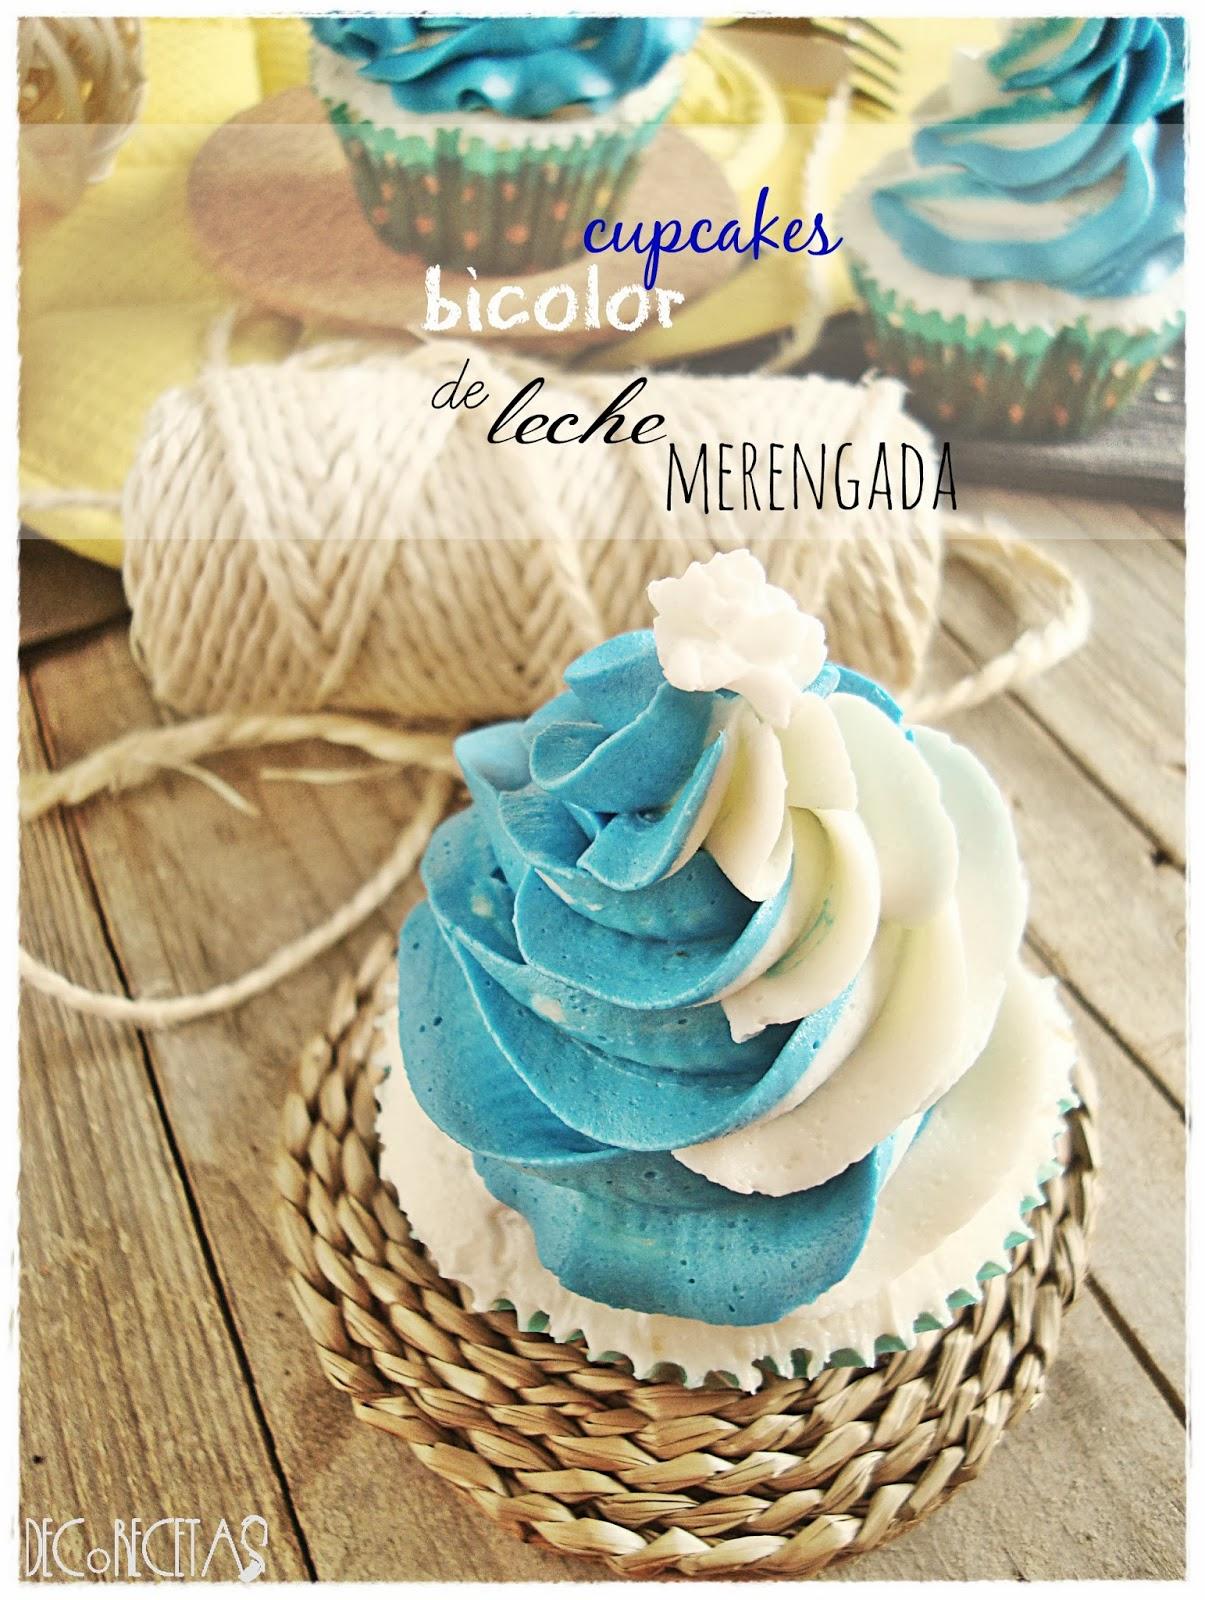 Cupcakes bicolor de leche merengada